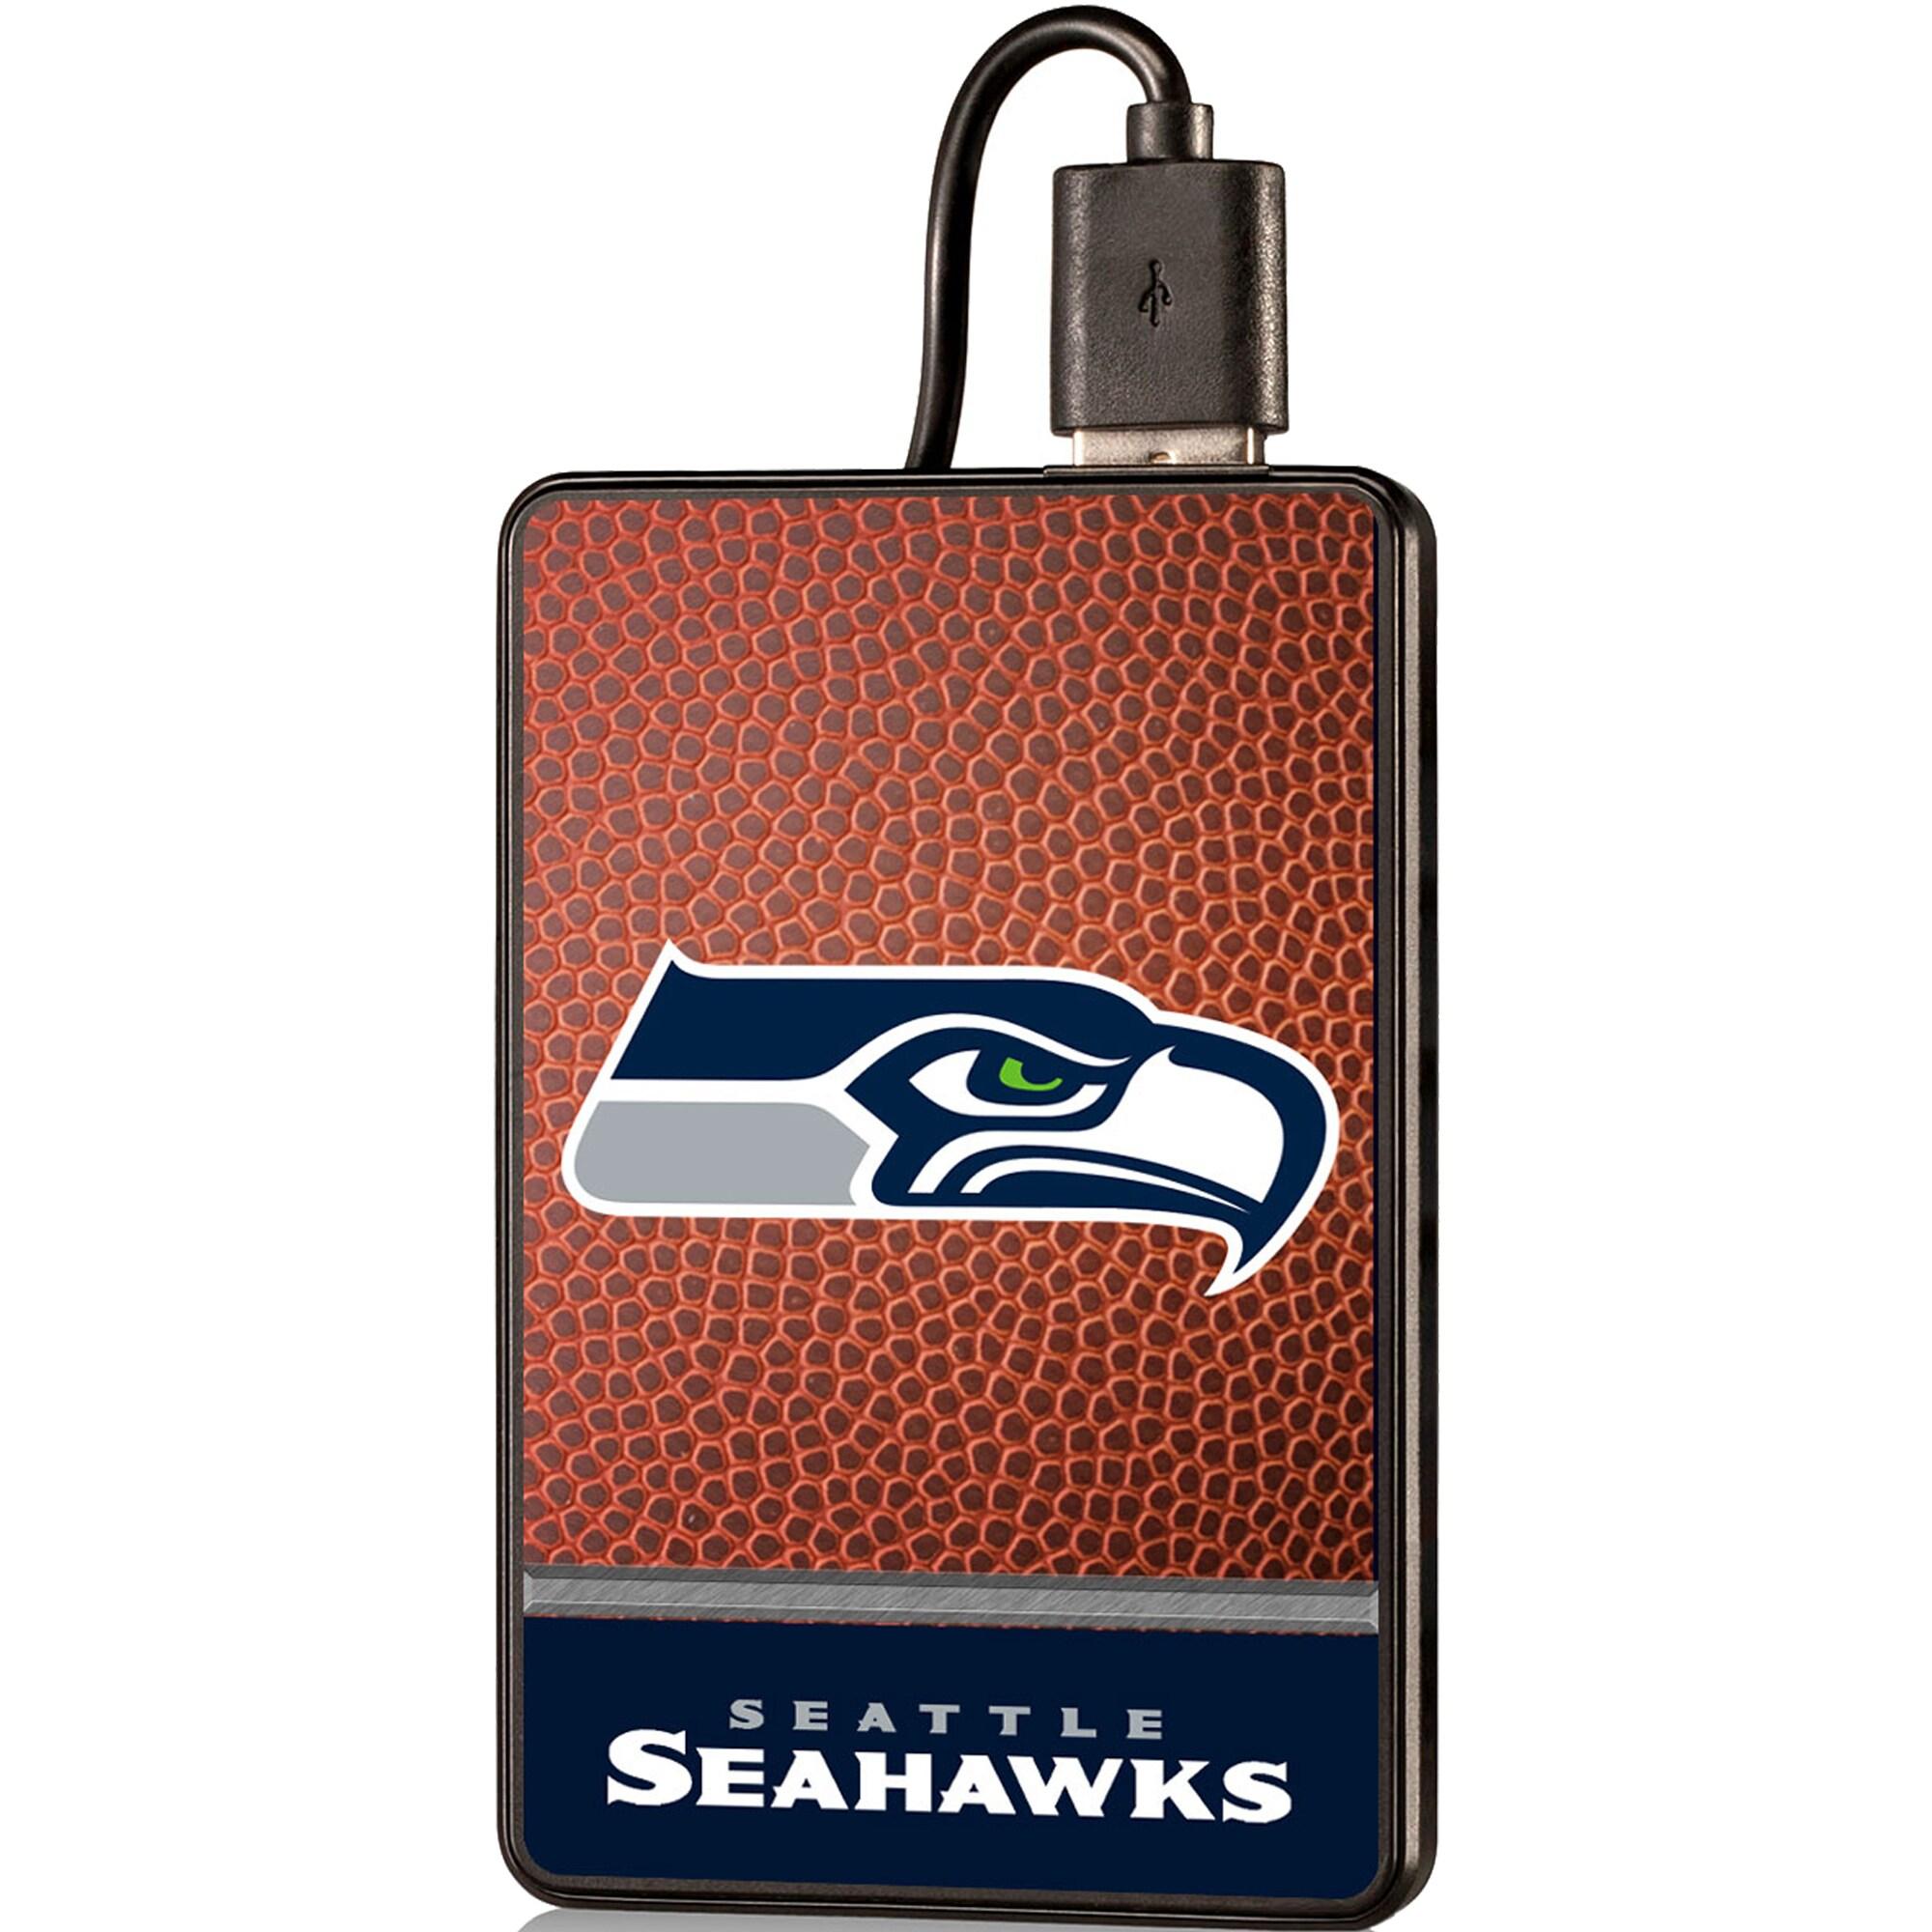 Seattle Seahawks 2000 mAh Credit Card Powerbank